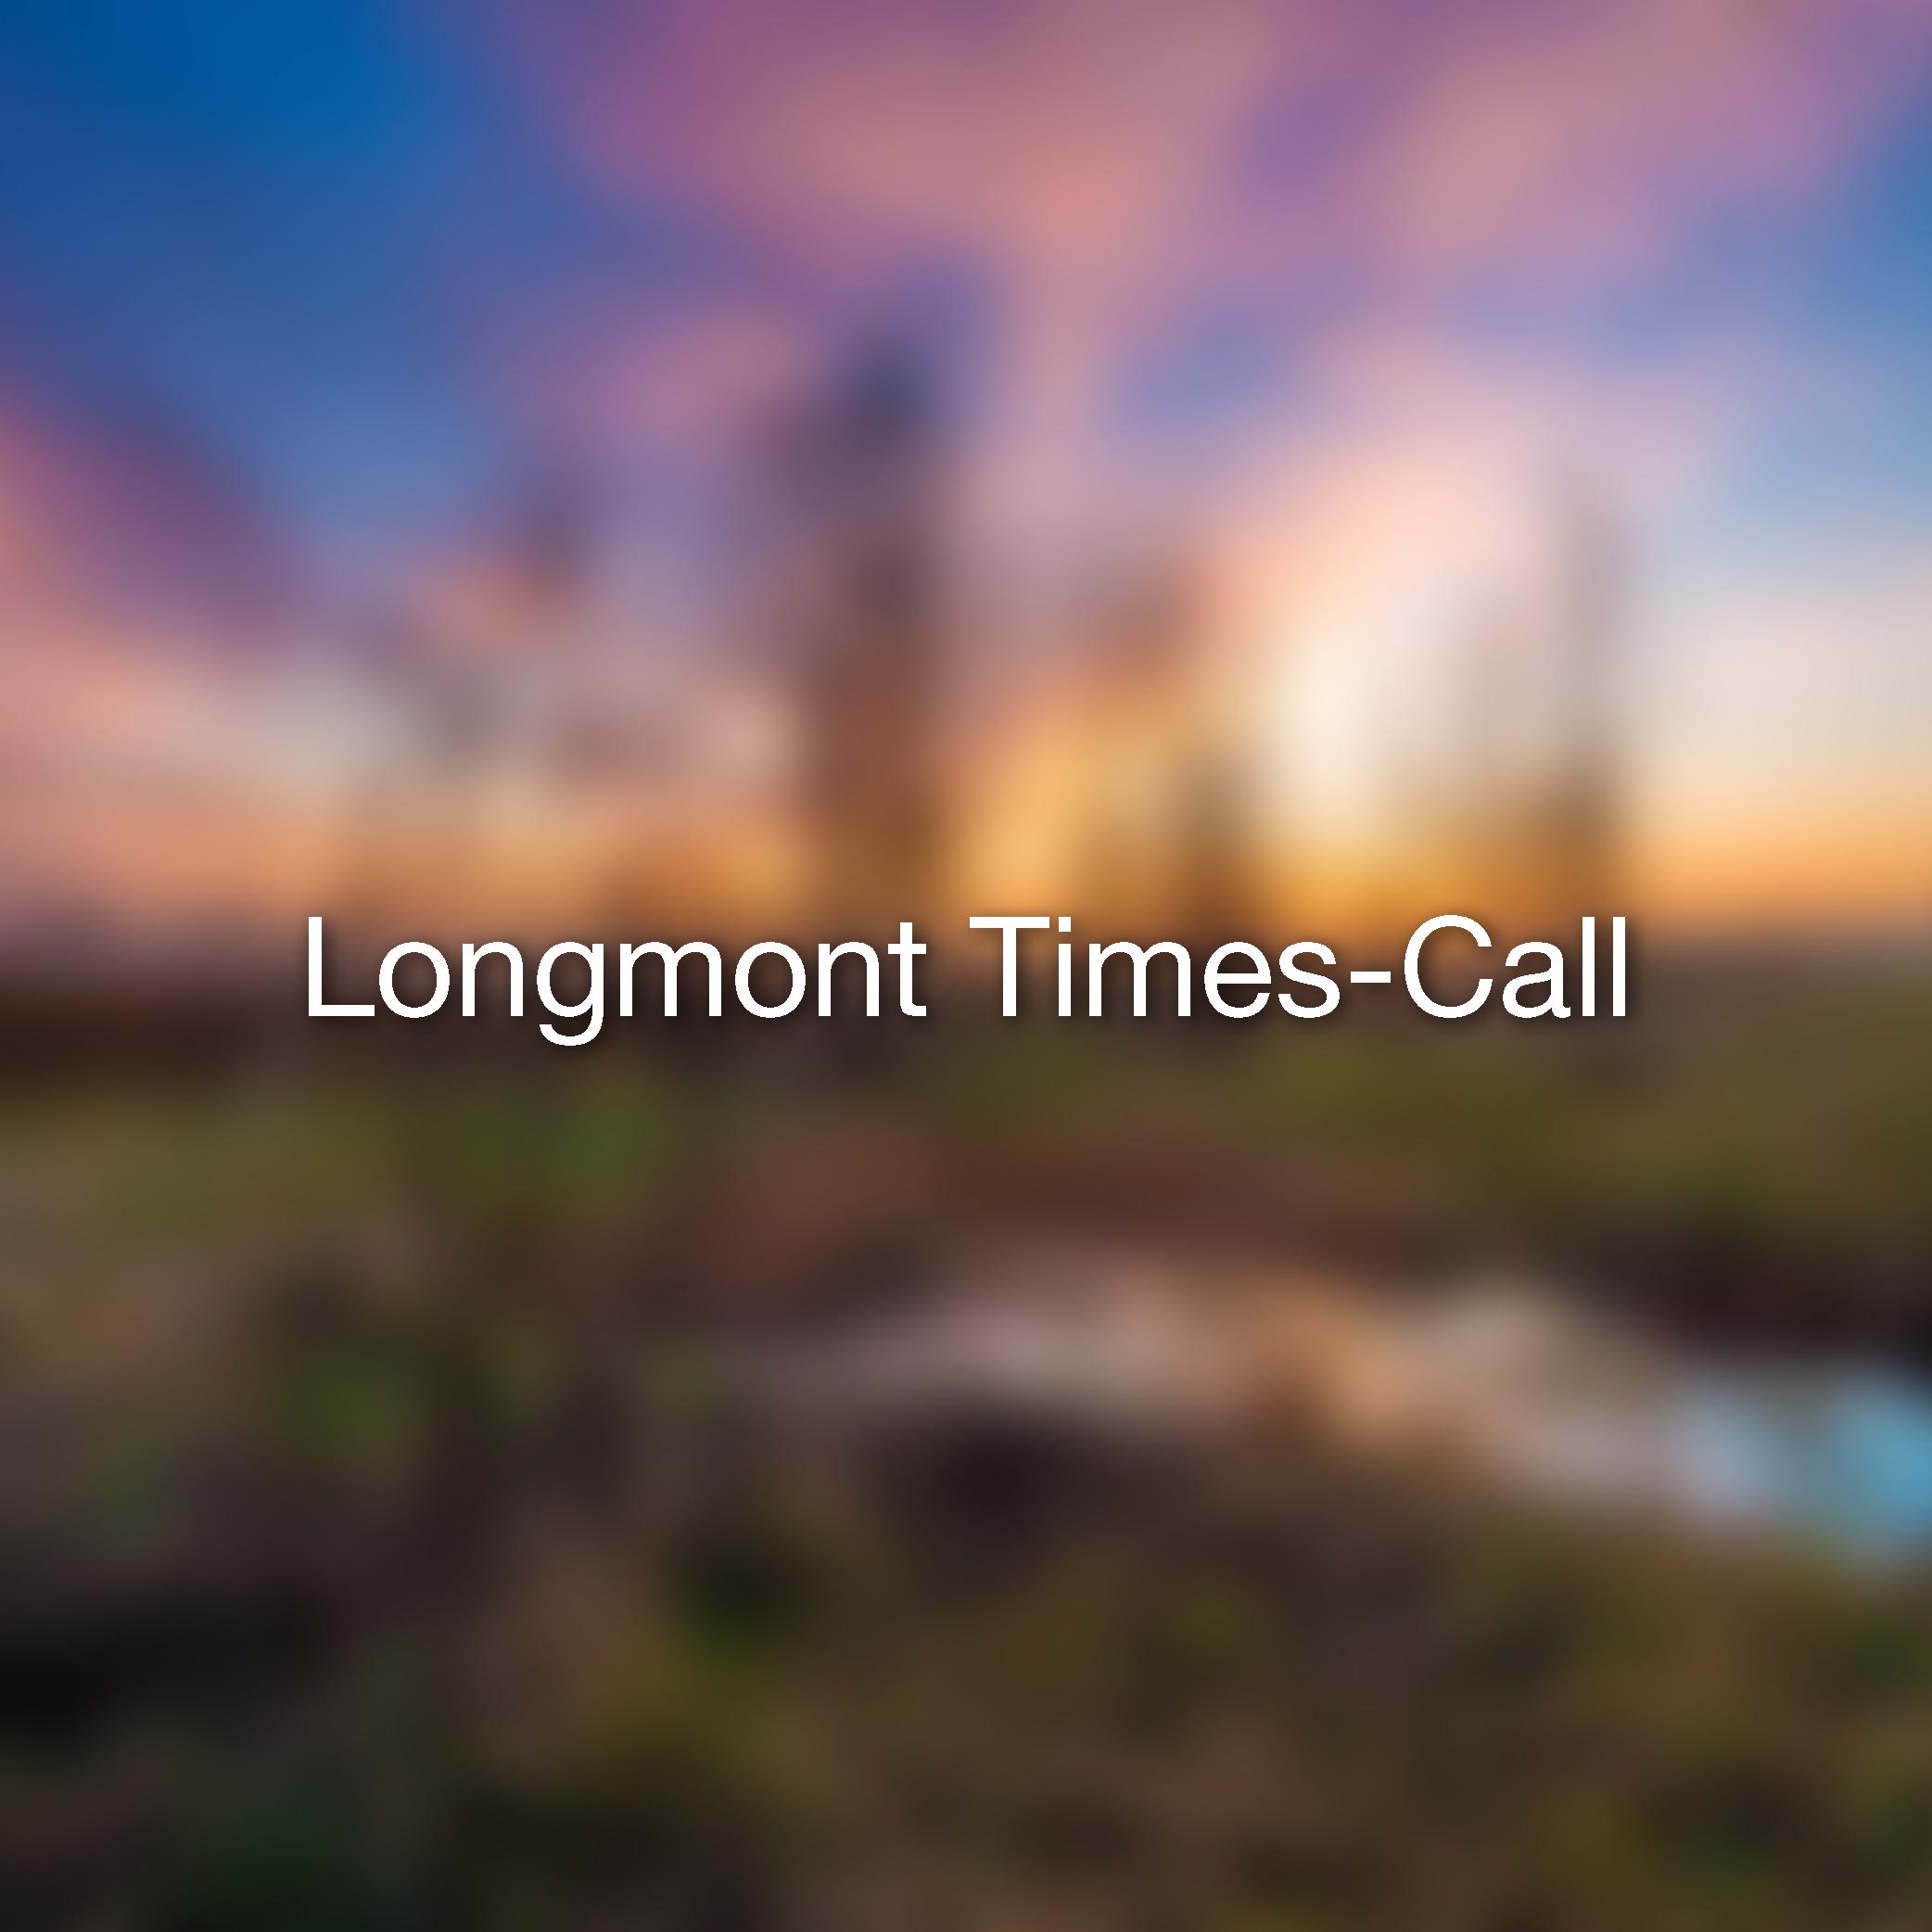 Longmont Times-Call